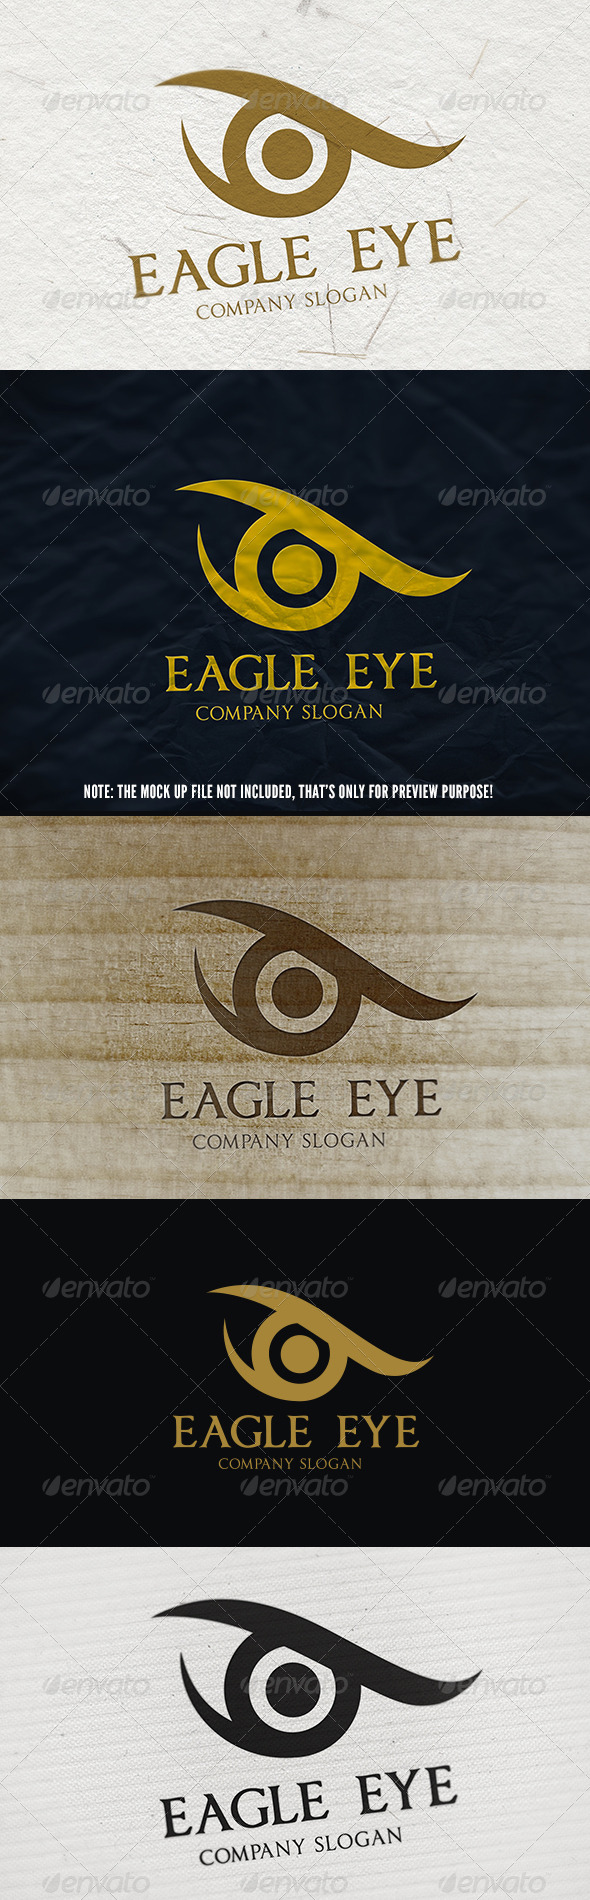 GraphicRiver Eagle Eye Logo 5637149